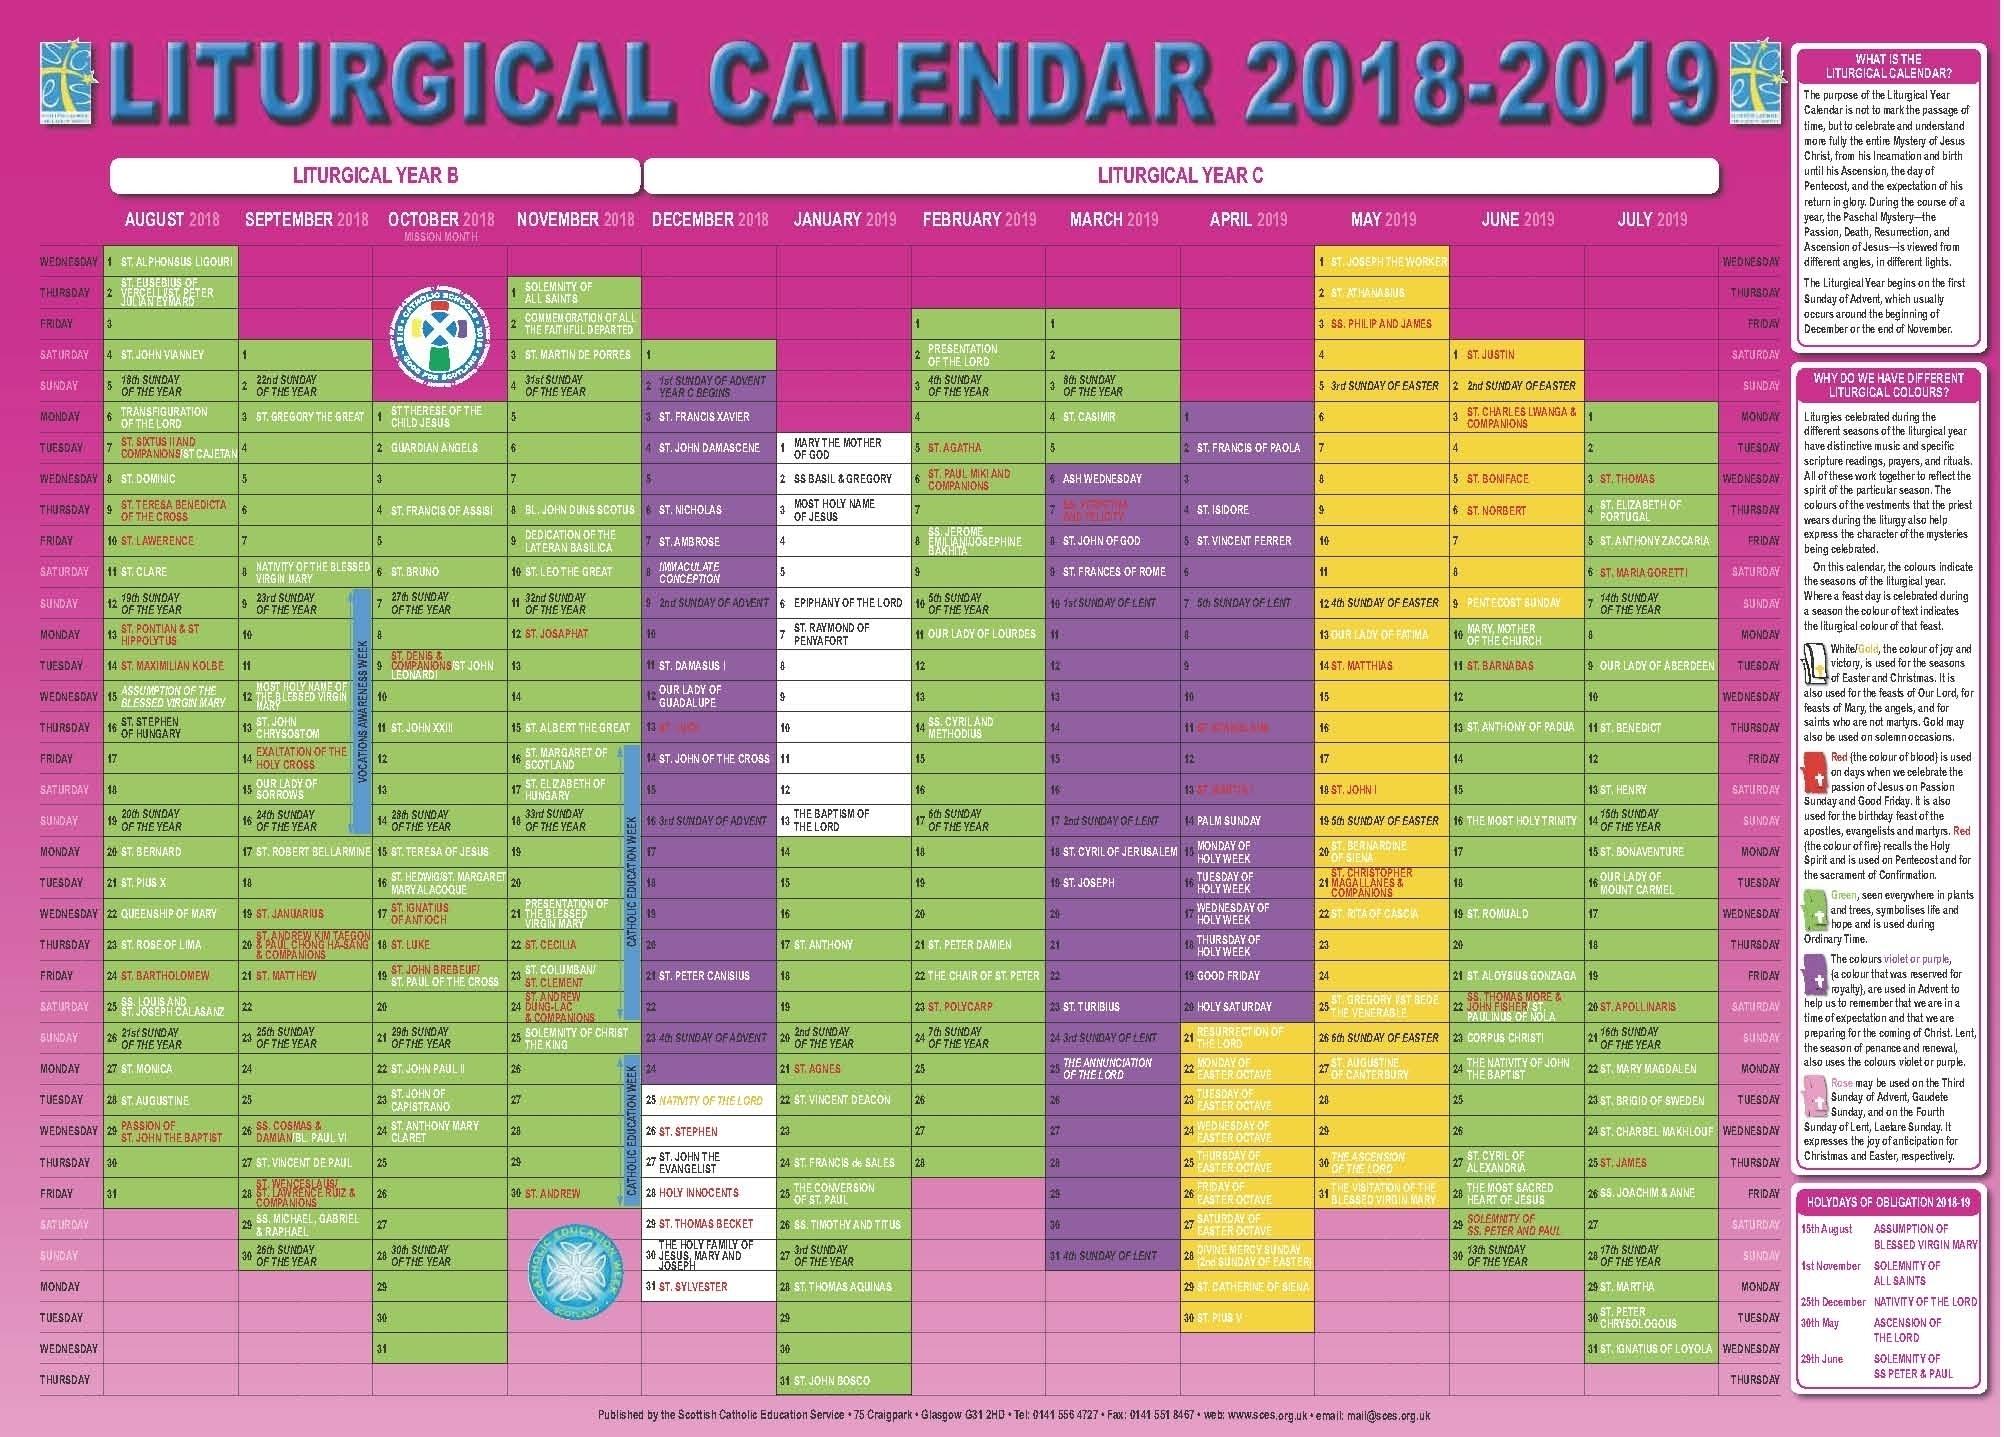 Catholic Liturgical Calendar 2020 Pdf - Calendar Inspiration intended for Liturgical Year Printable Calendars Catholic